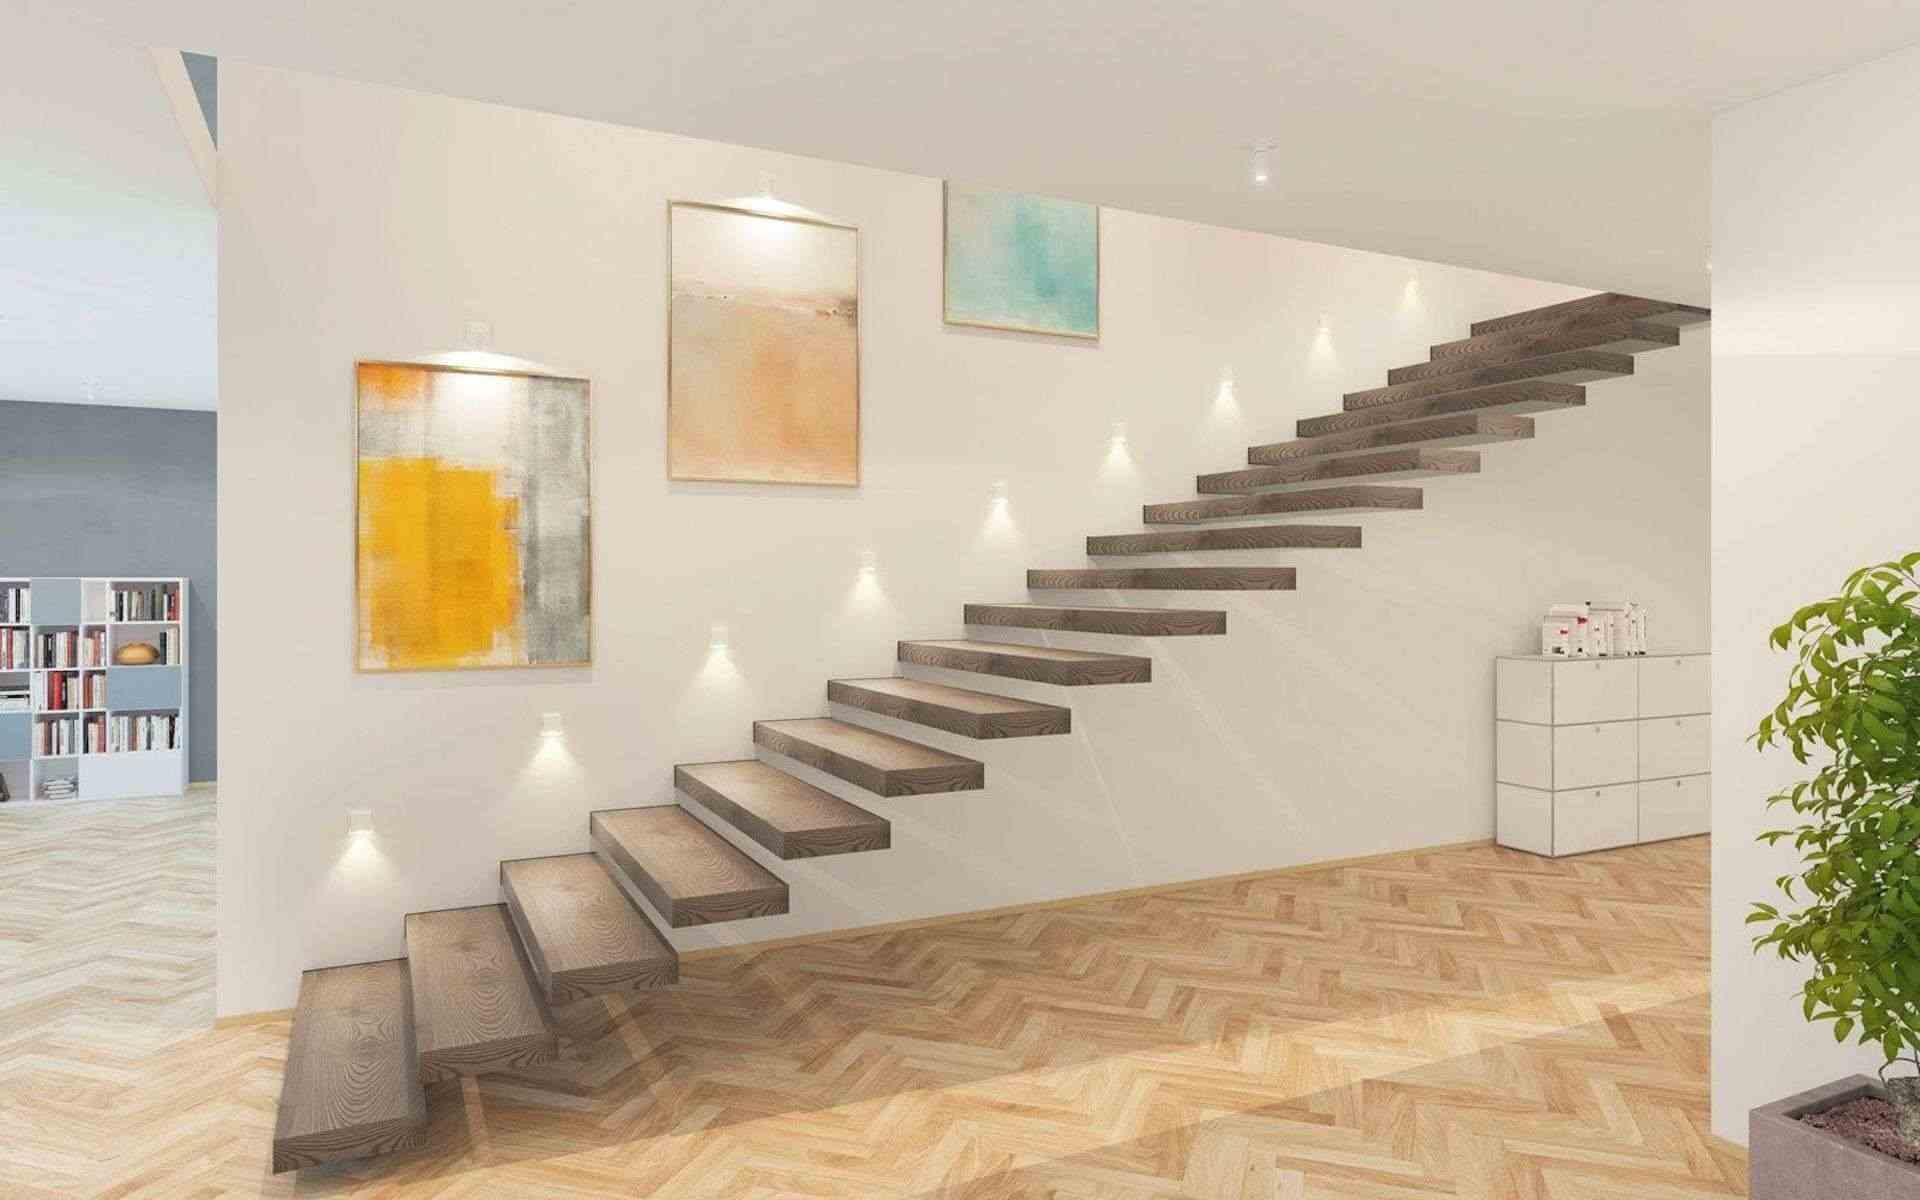 plug and light als Orientierungsleuchte an der Treppe